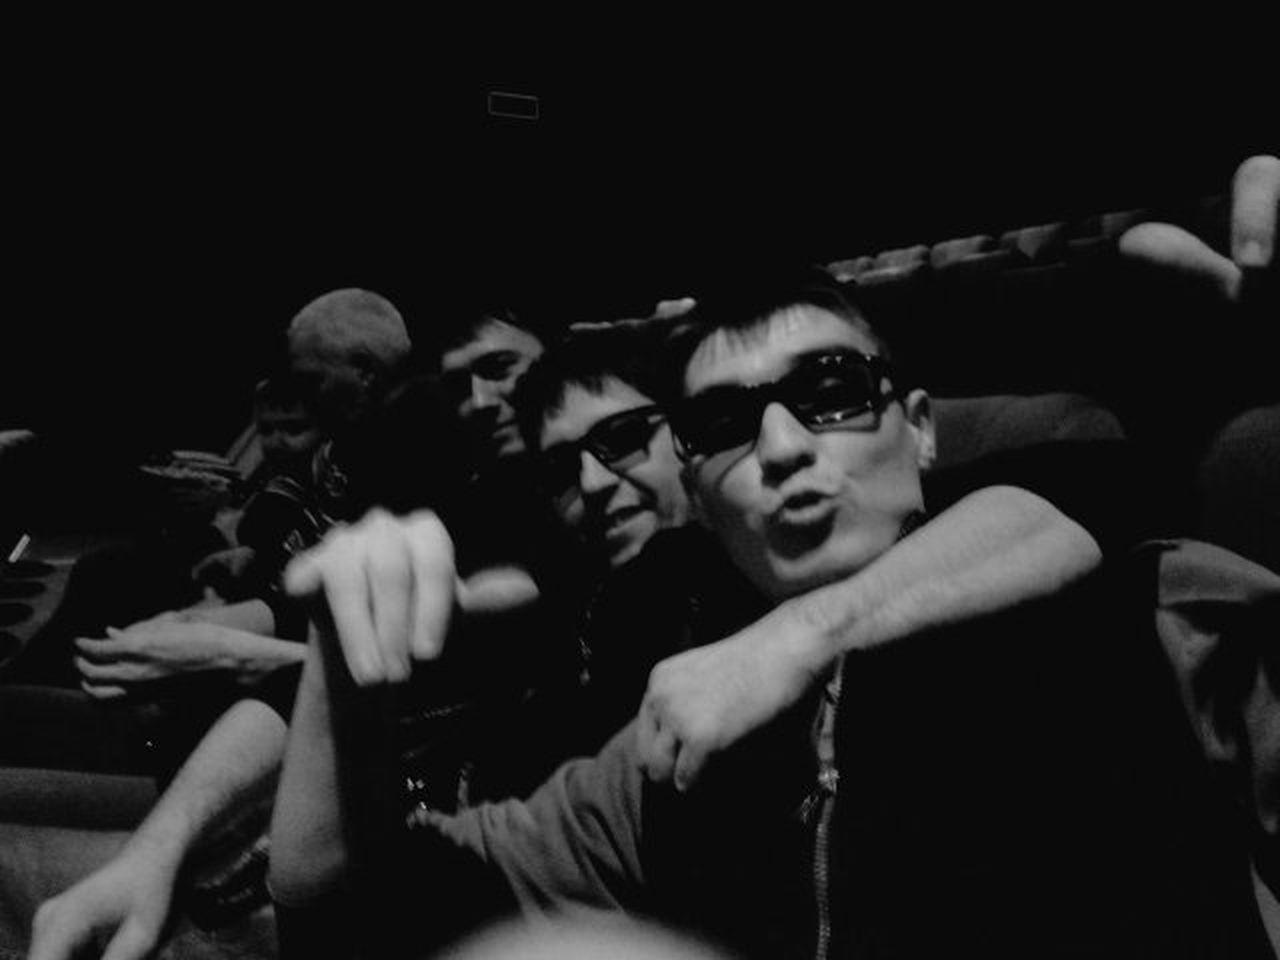 #cinema #ducklips #friends #selfie Friendship Lifestyles Looking At Camera Portrait